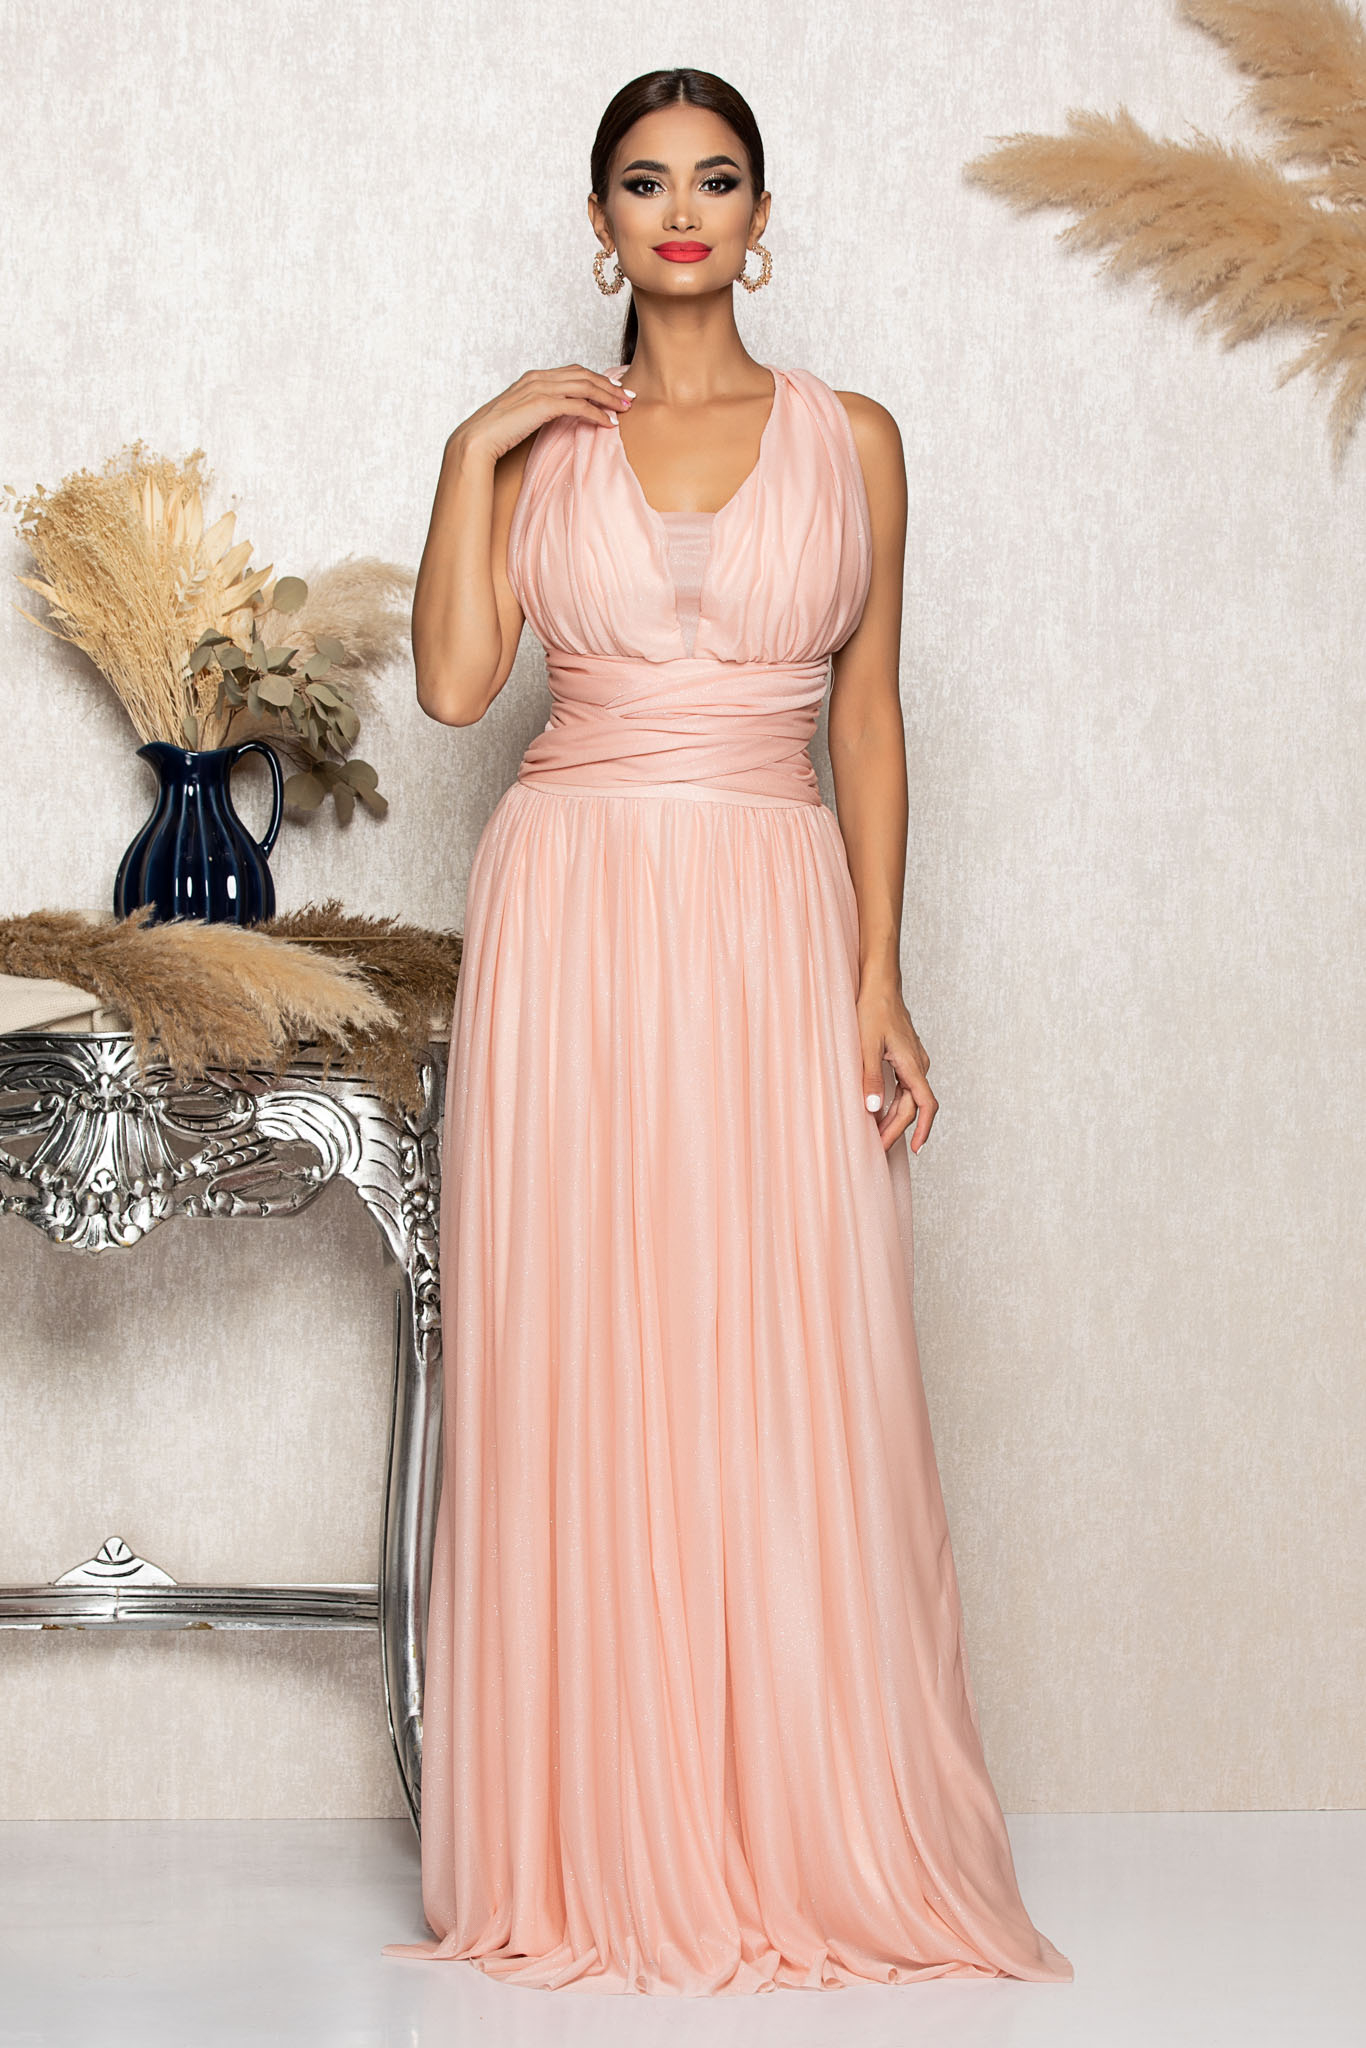 Rochie Sophisticated Peach Marimi Mari M (38)   L (40)   XL (42)   XXL (44)   3XL (46)